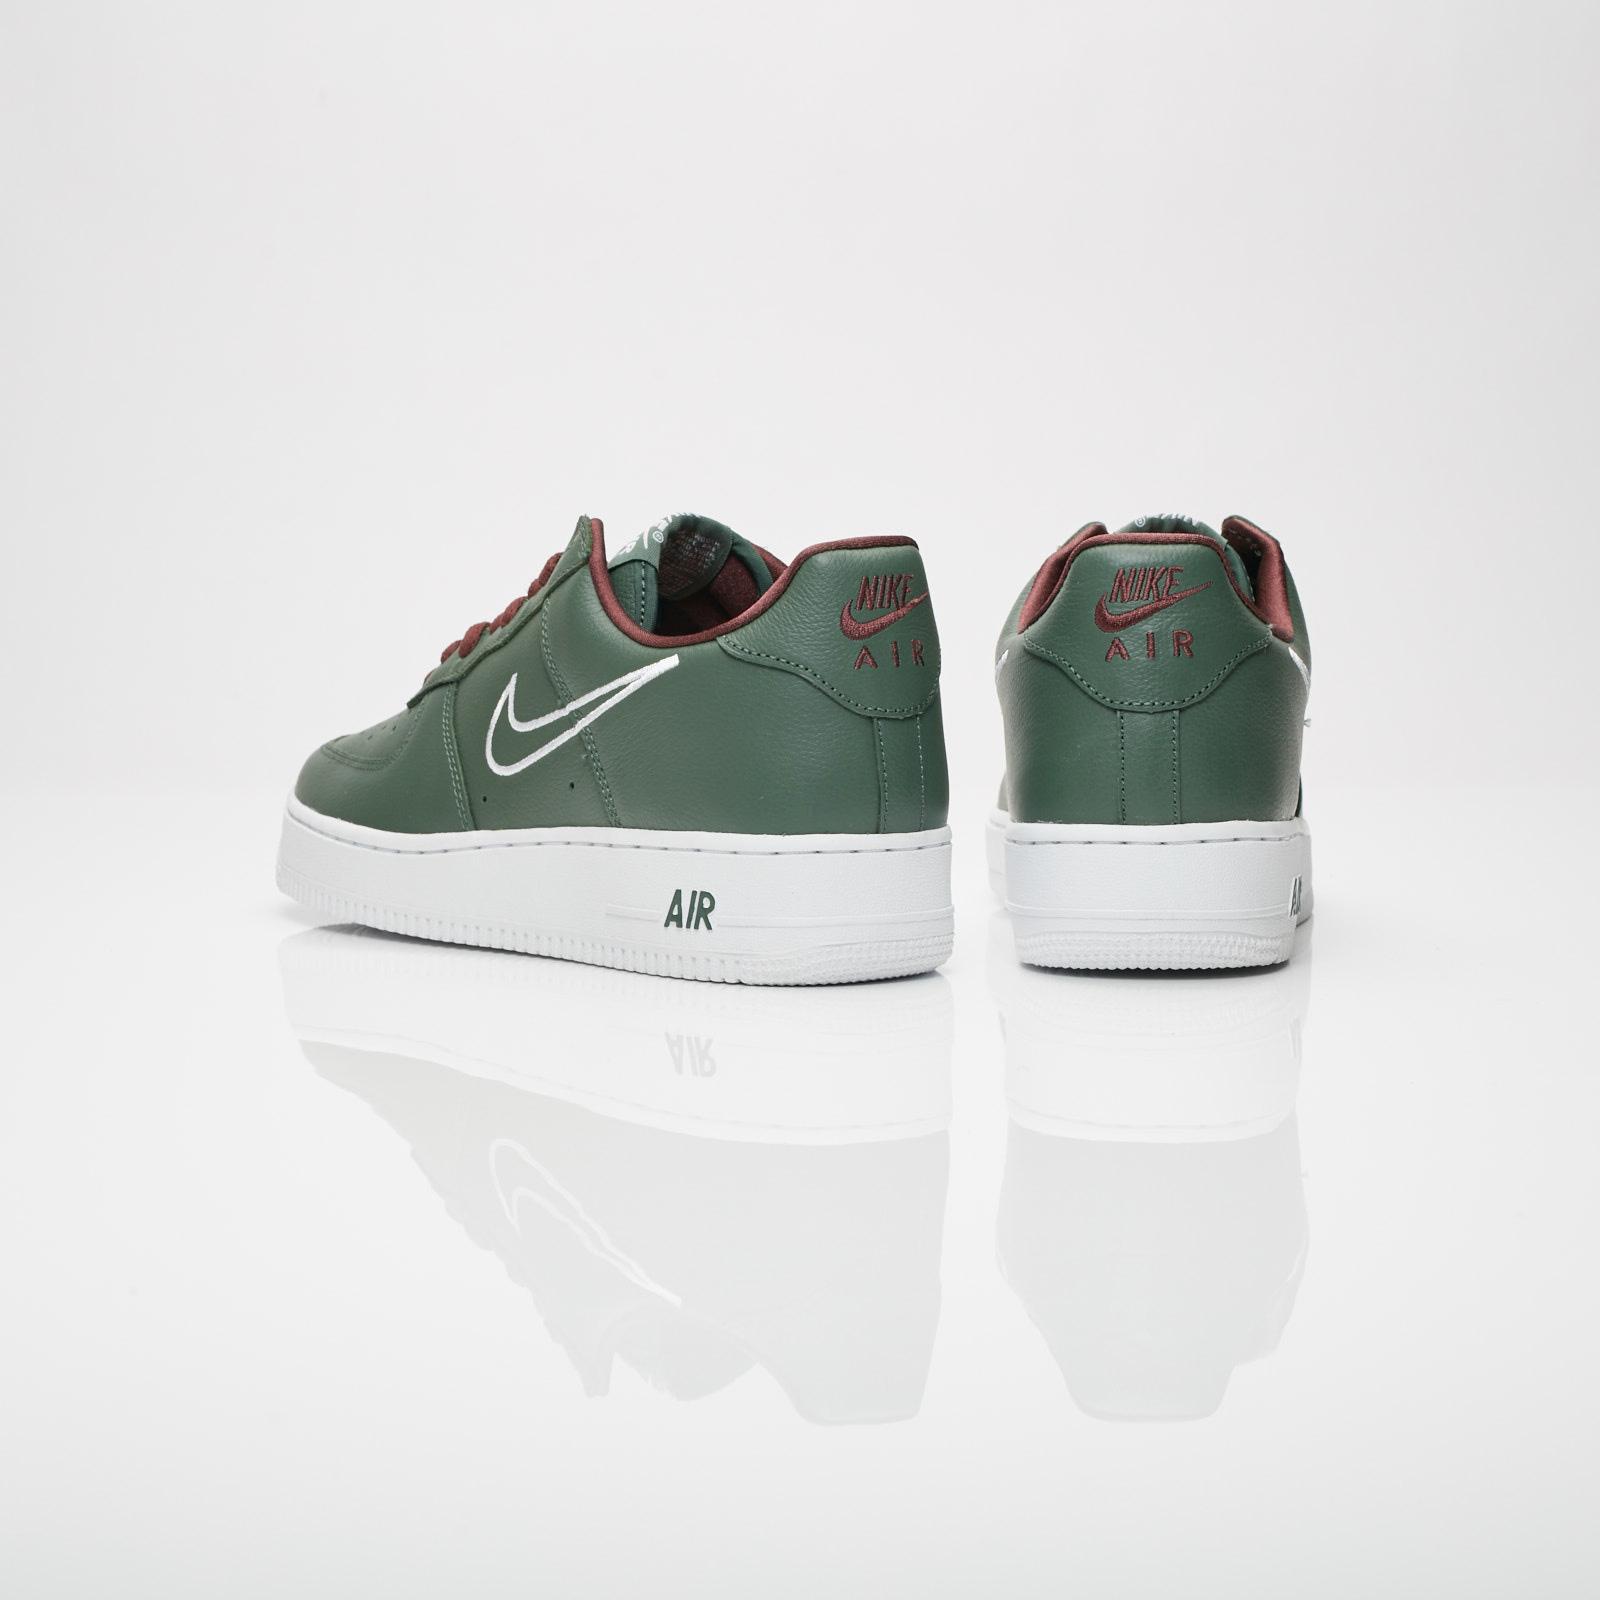 Retro Sneakersnstuff Force 1 300 Nike Air Low Hong 845053 Kong 08wOnPXk